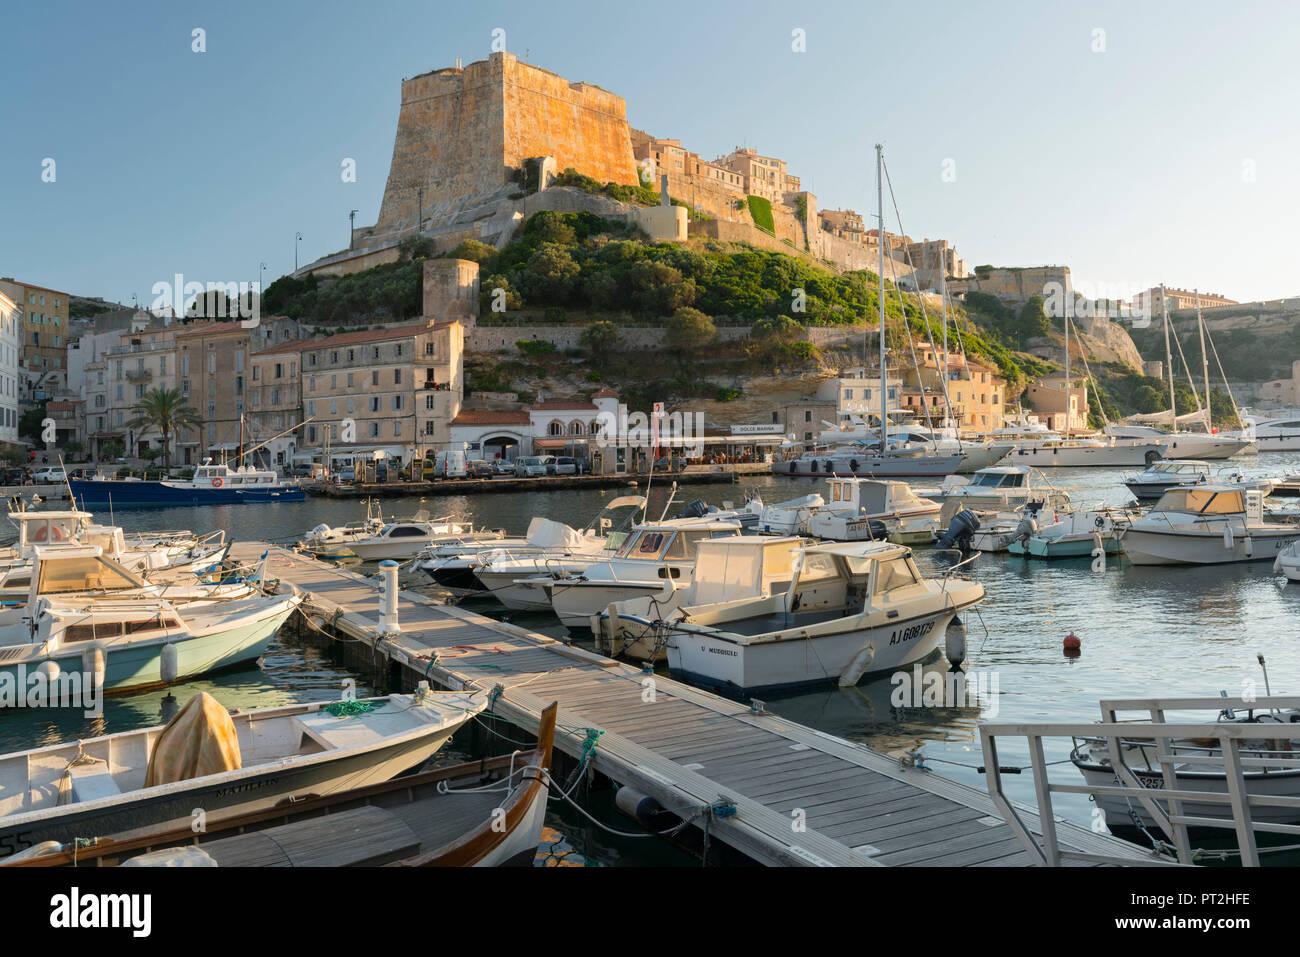 Port and citadel of Bonifacio, Corse du Sud, Corsica, France - Stock Image